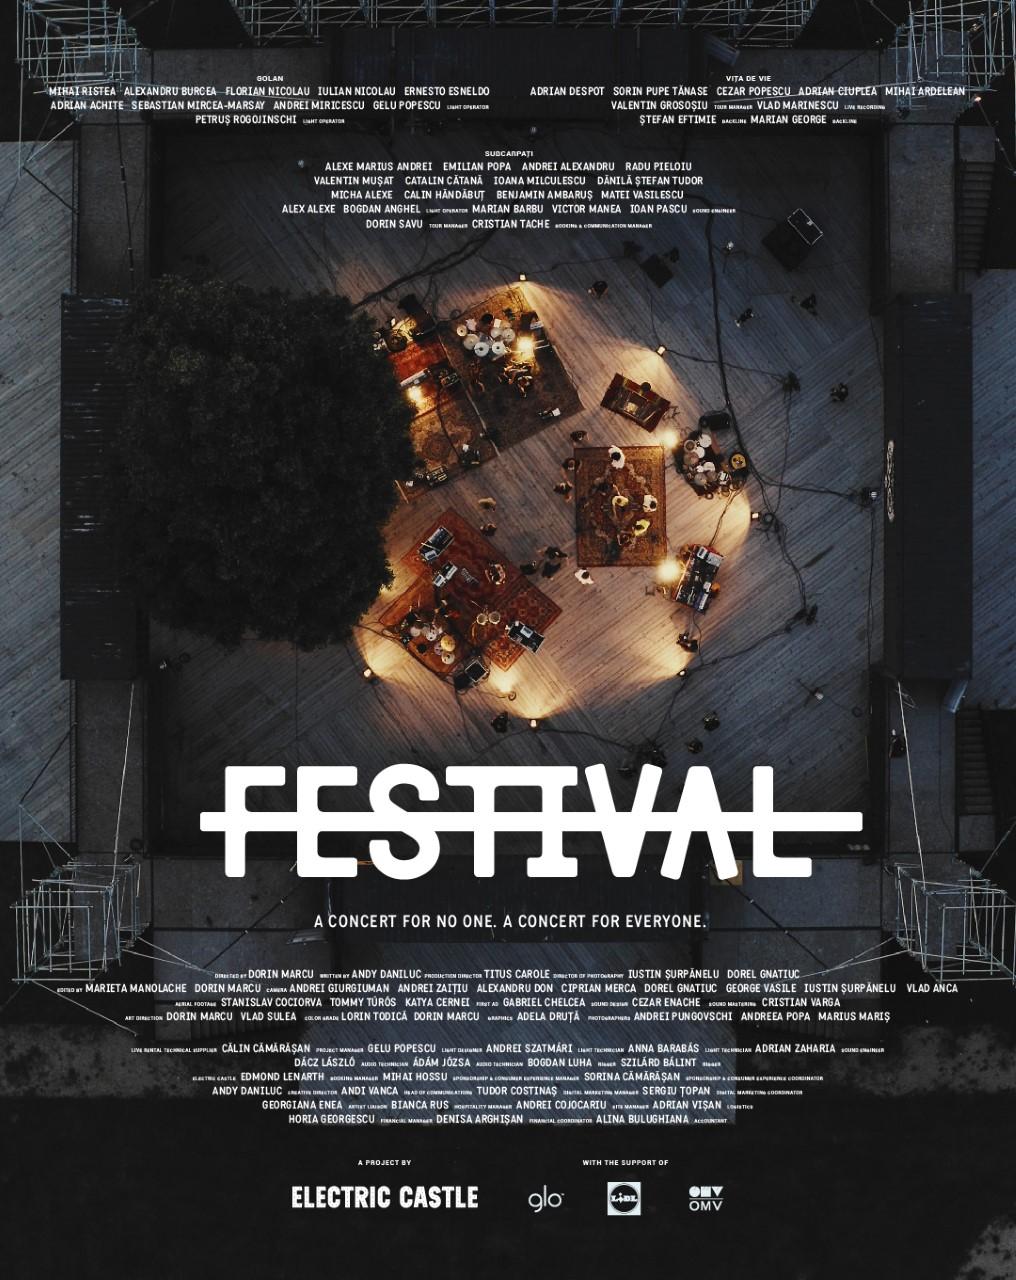 No Festival by Electric Castle